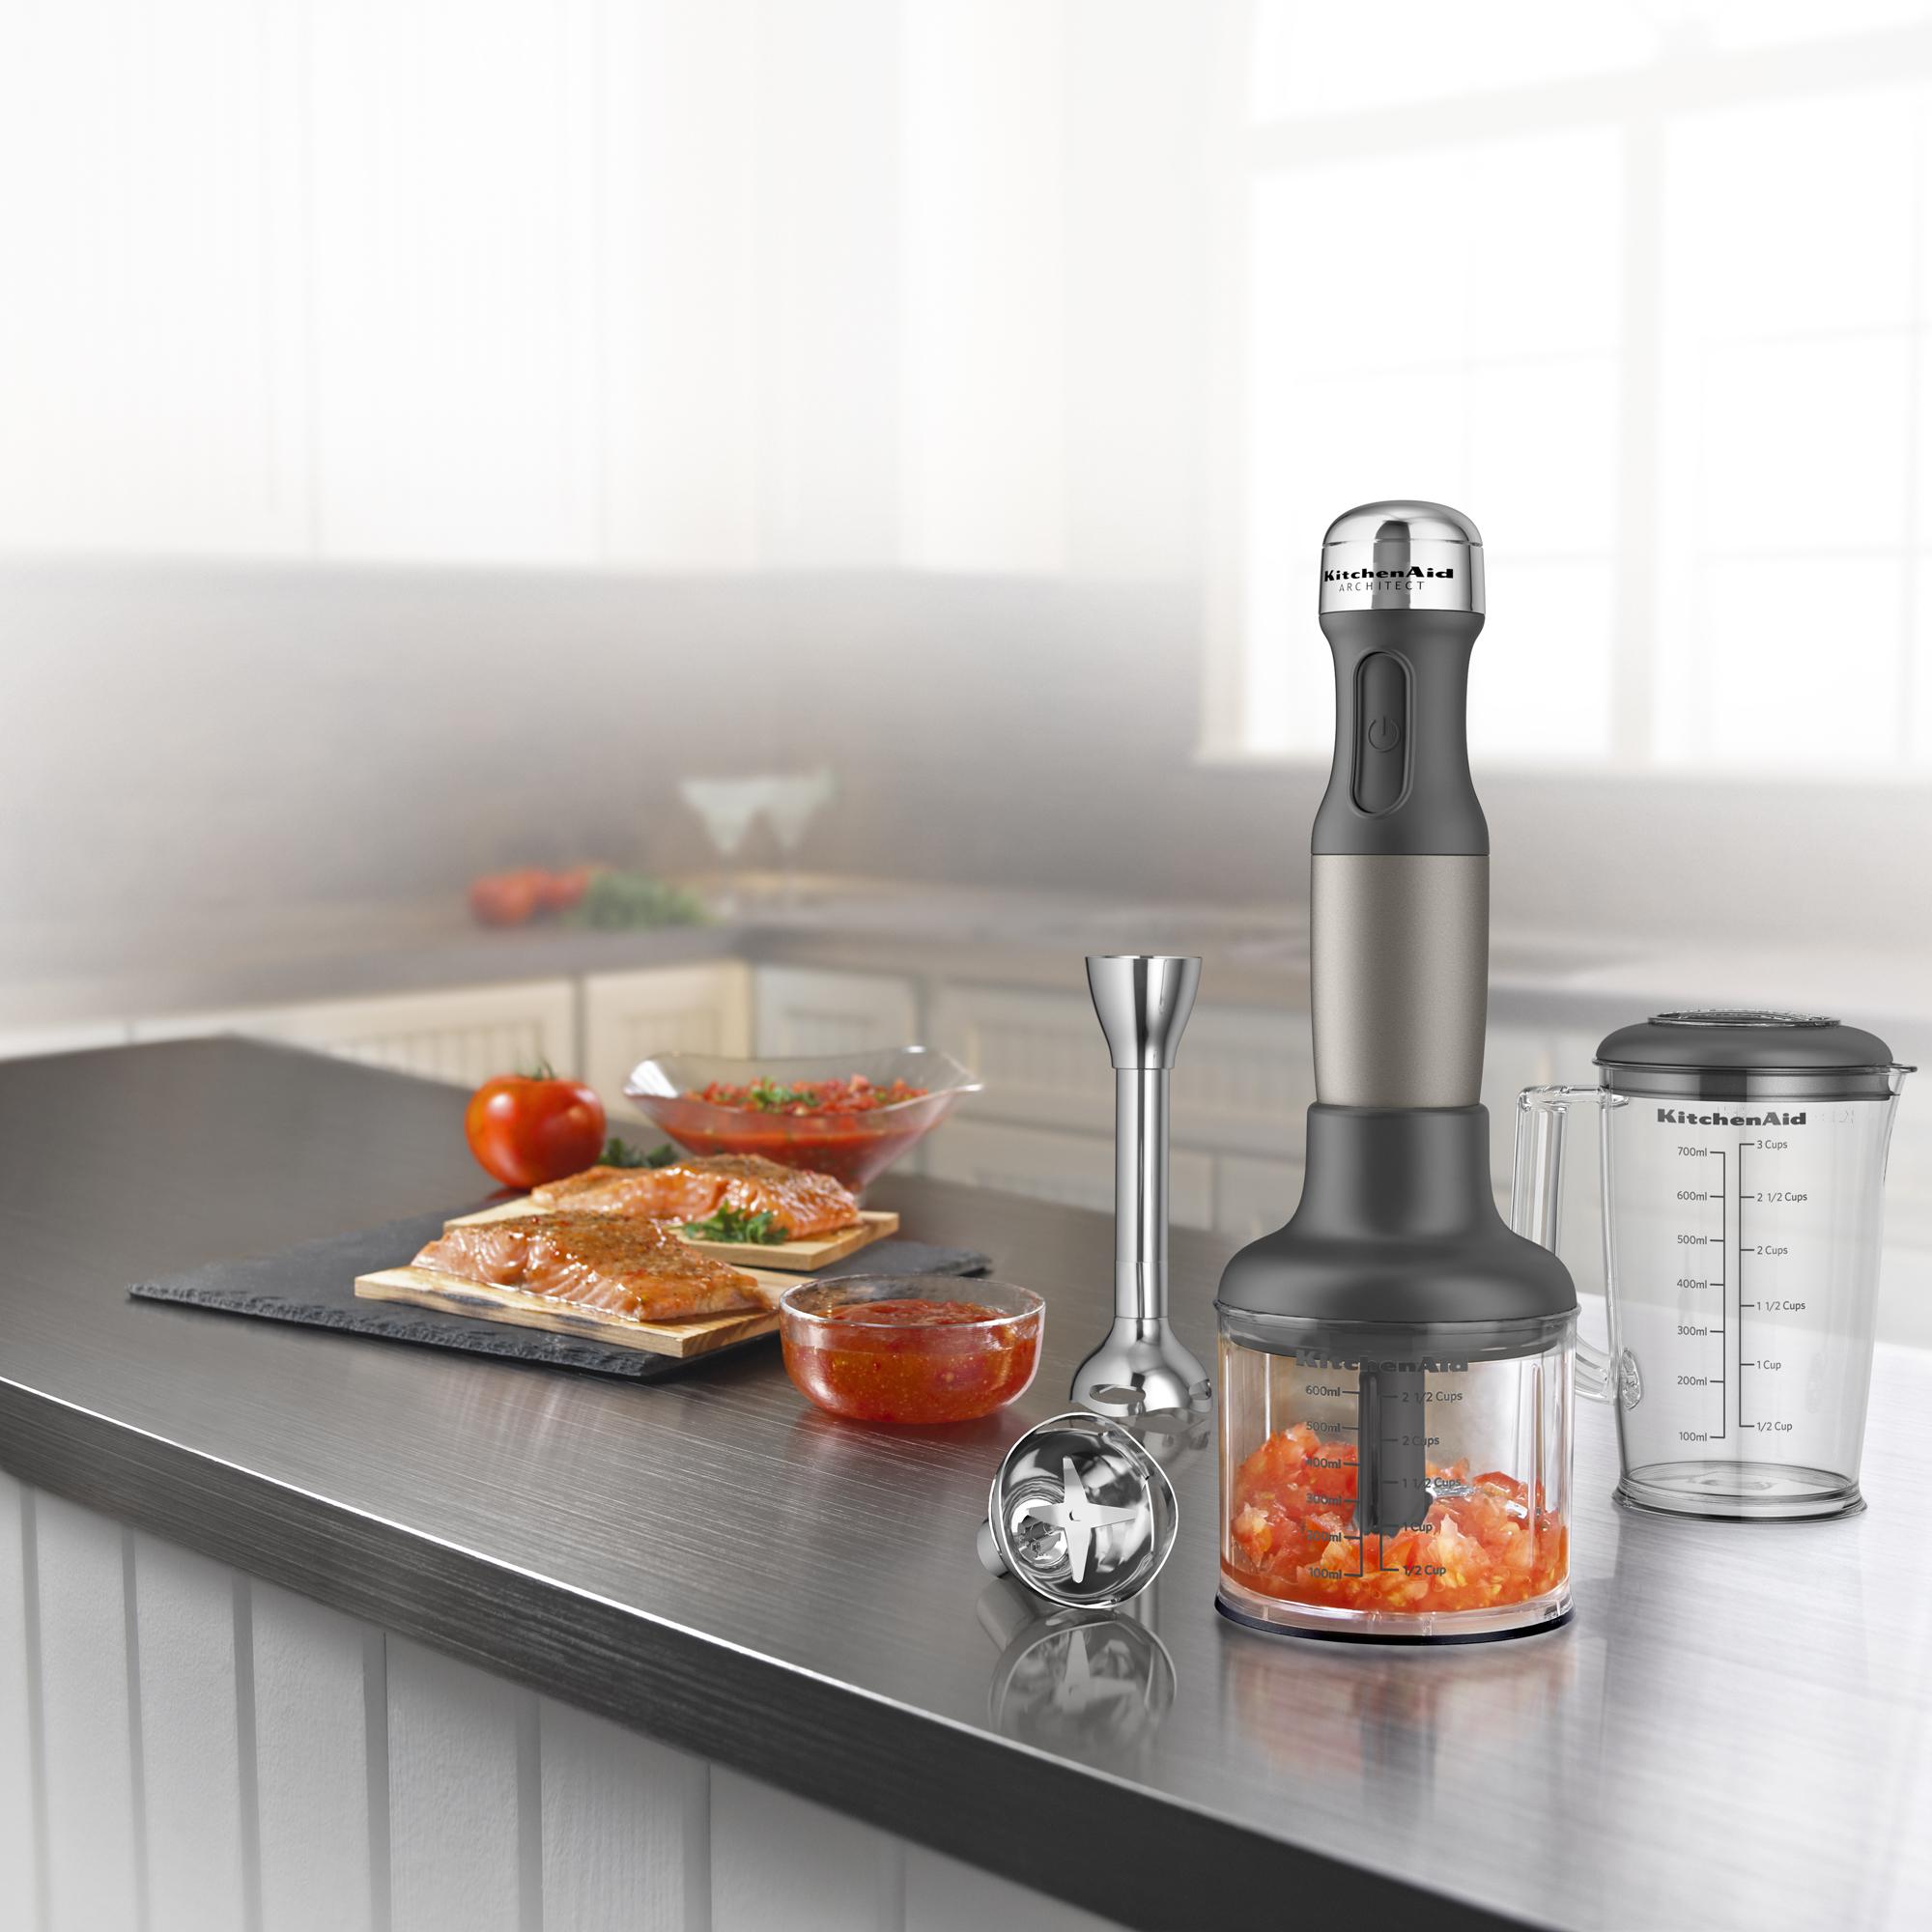 RKHB2351 KitchenAid® Refurbished 3-Speed Hand Blender